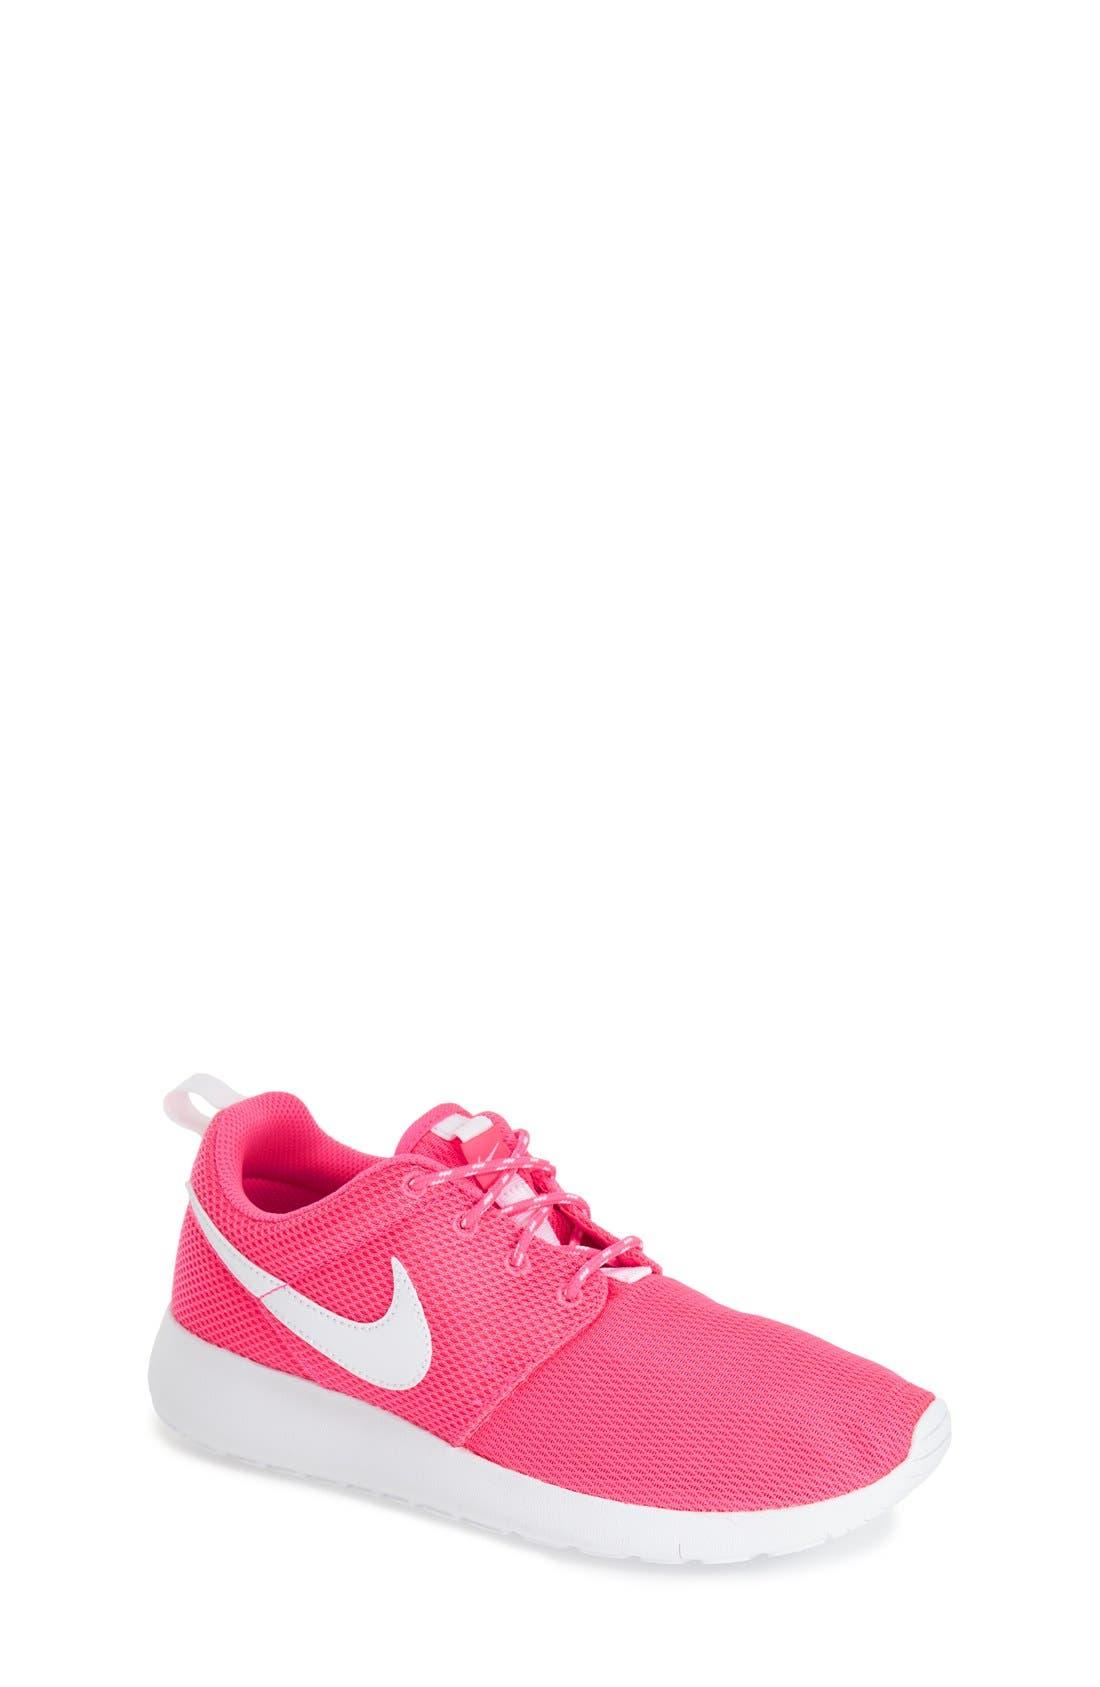 'Roshe Run' Athletic Shoe,                             Main thumbnail 51, color,